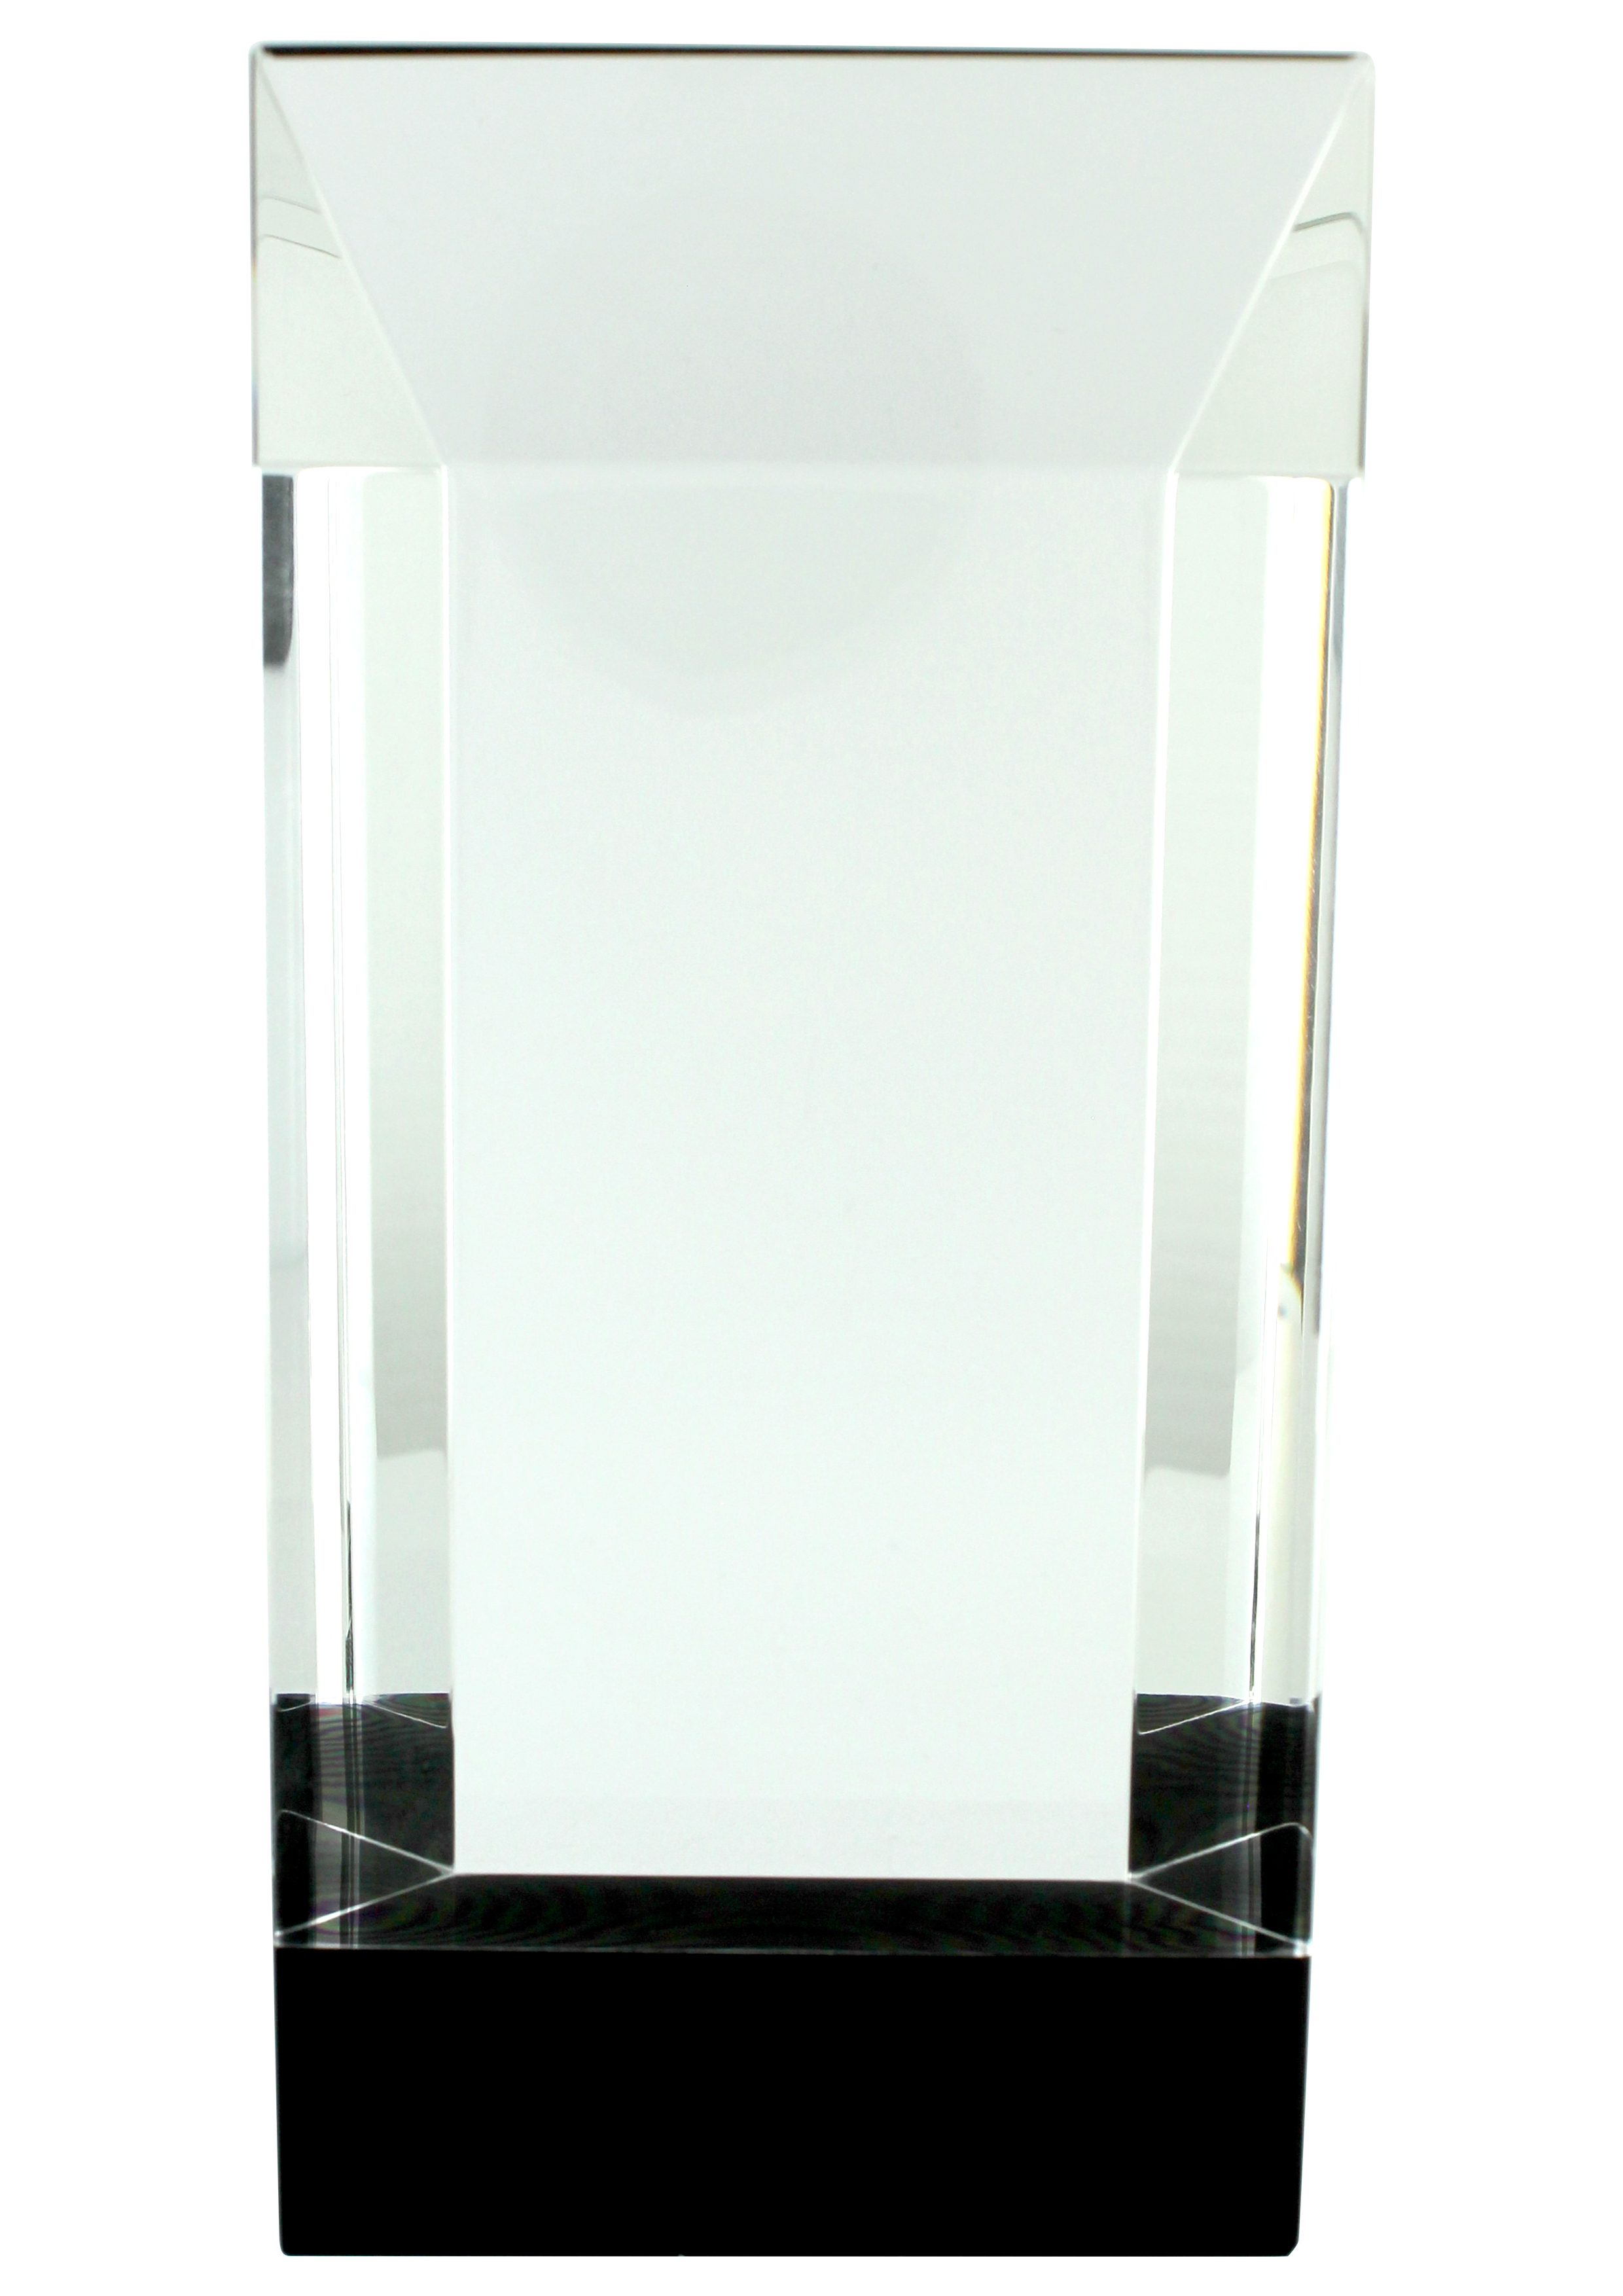 CC753 Crystal Award Image